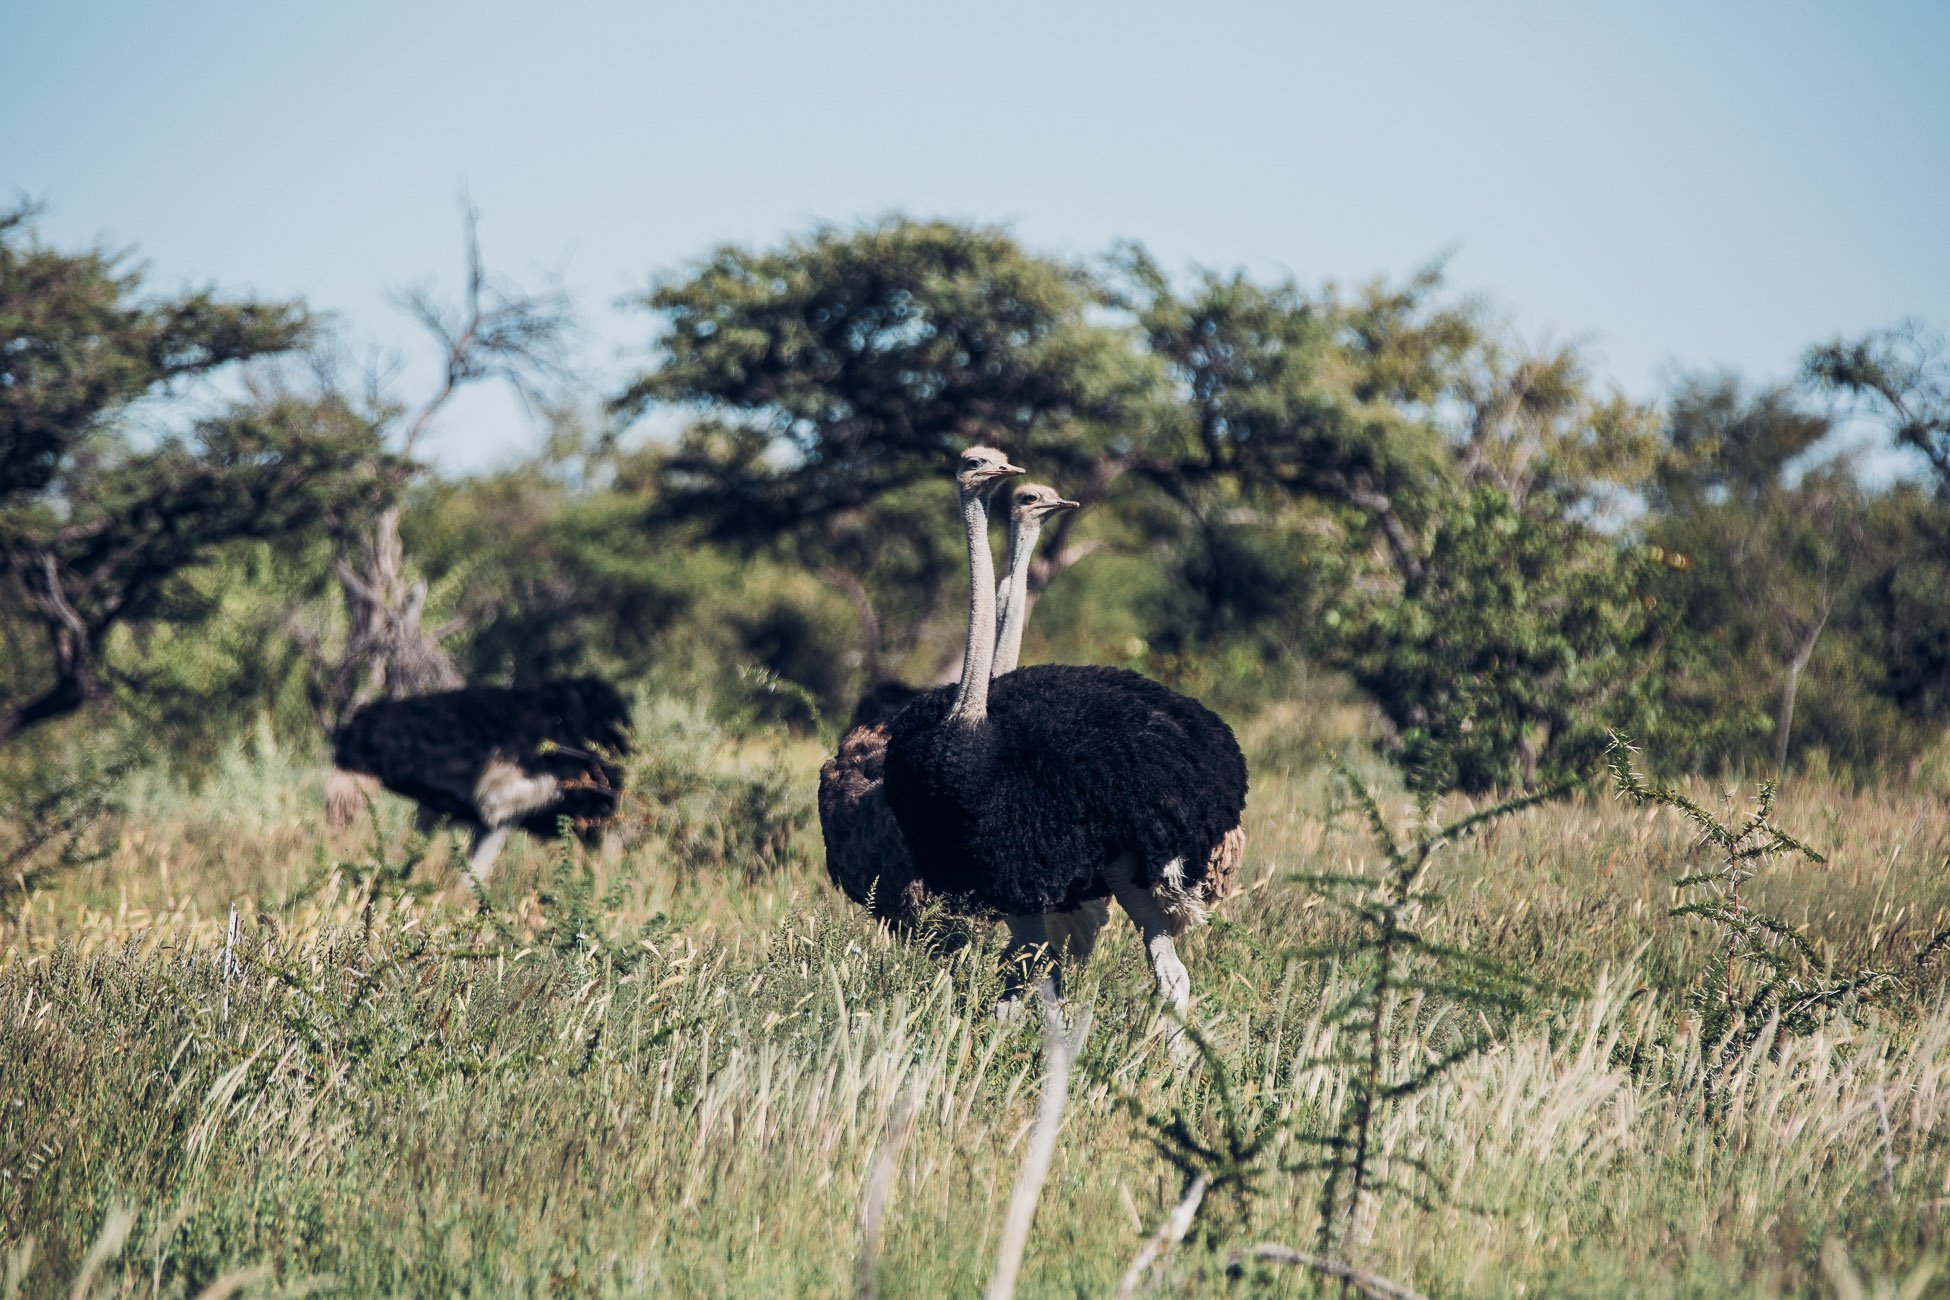 Ostrich at Etosha National Park